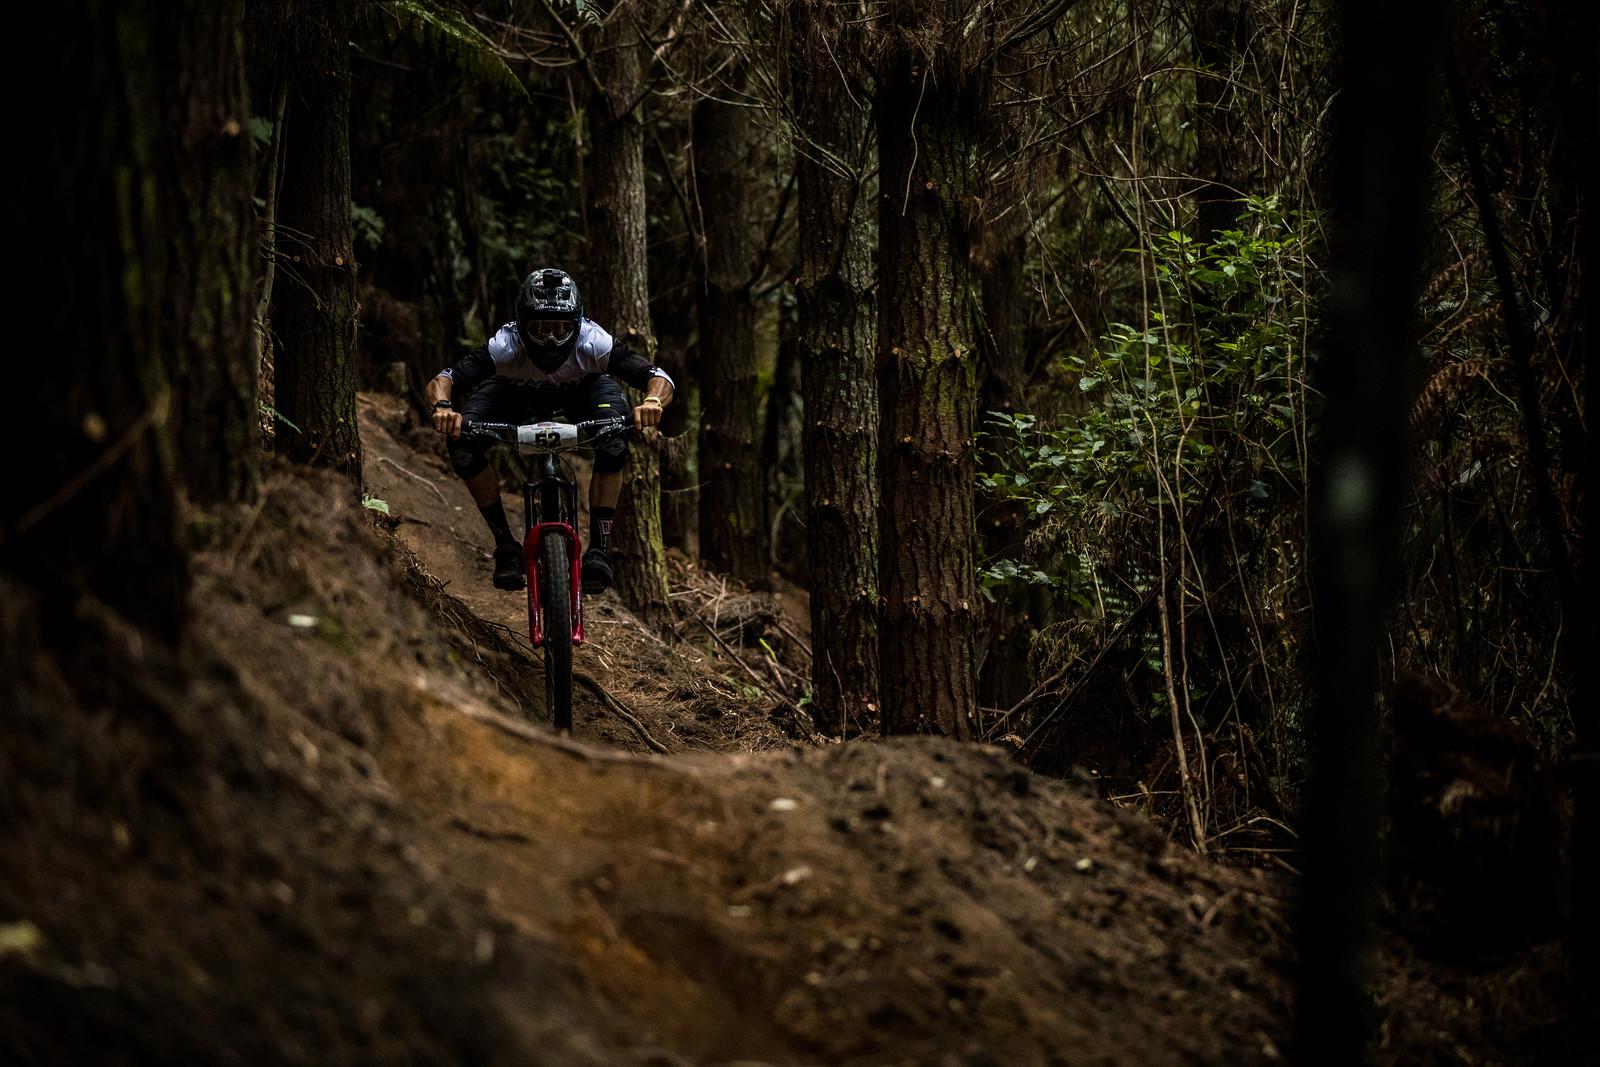 Sam Blenkinsop - 2019 Enduro World Series Crankworx Rotorua - Mountain Biking Pictures - Vital MTB